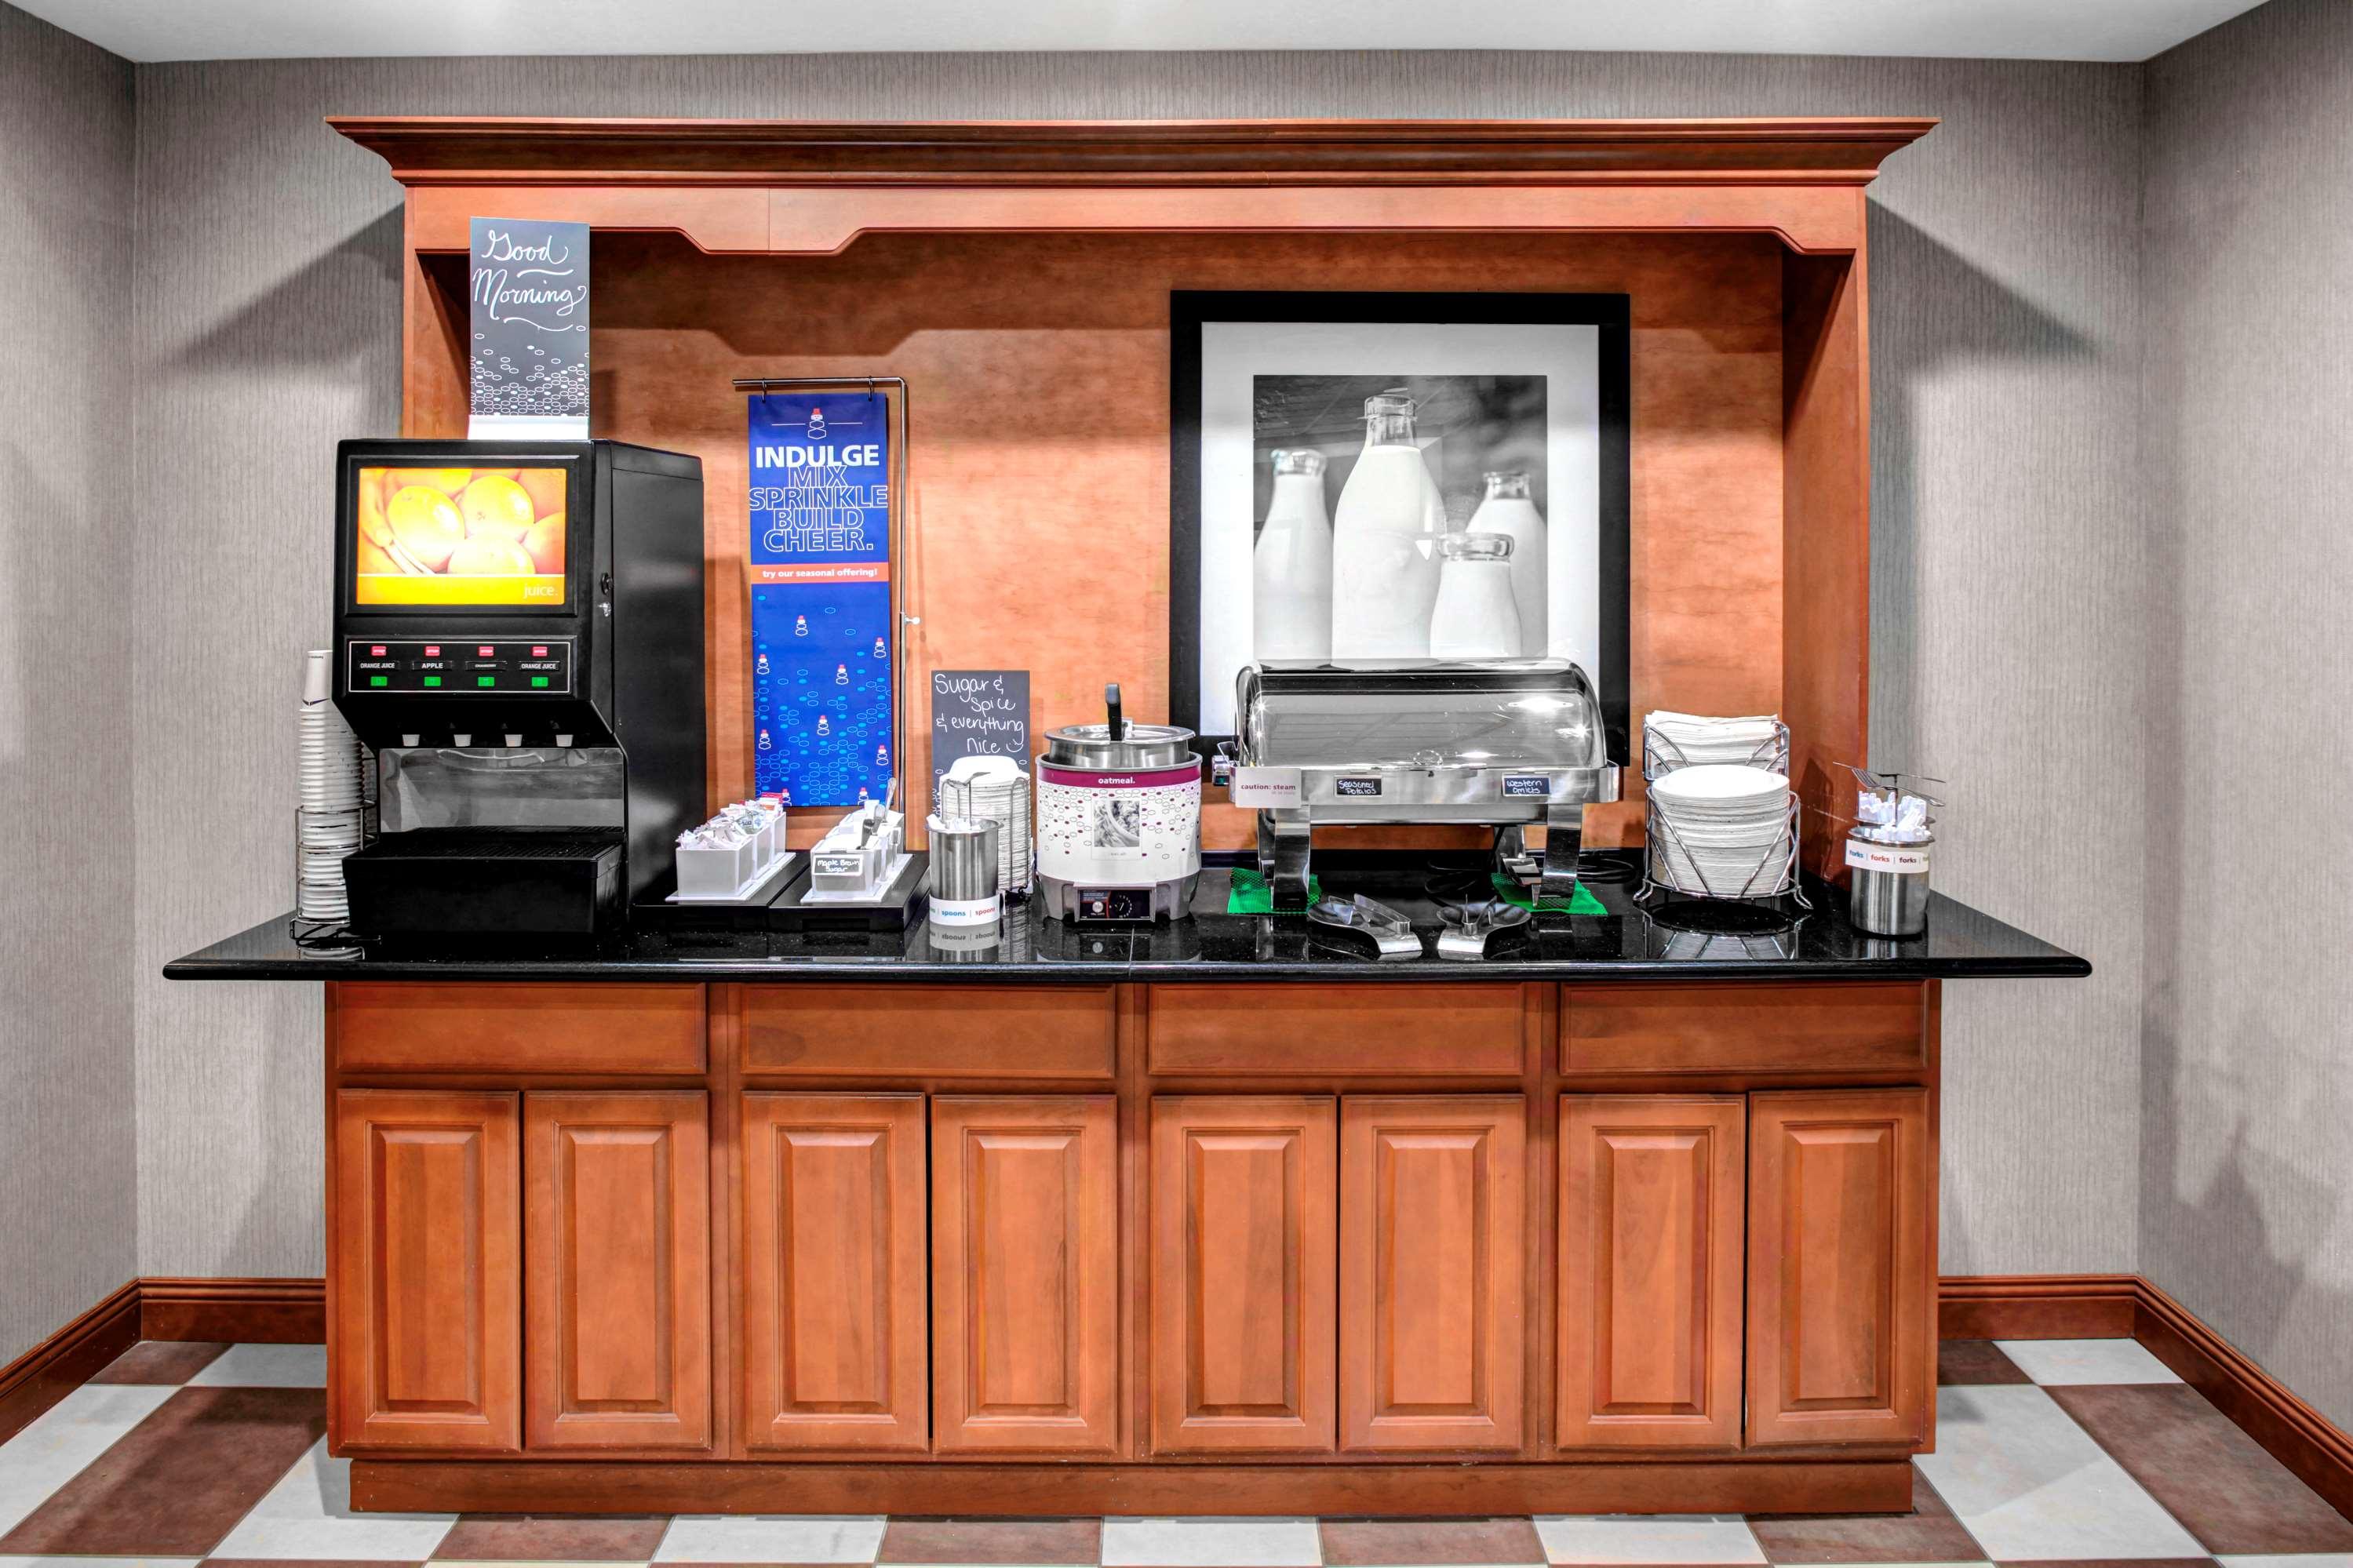 Hampton Inn Coldwater image 10